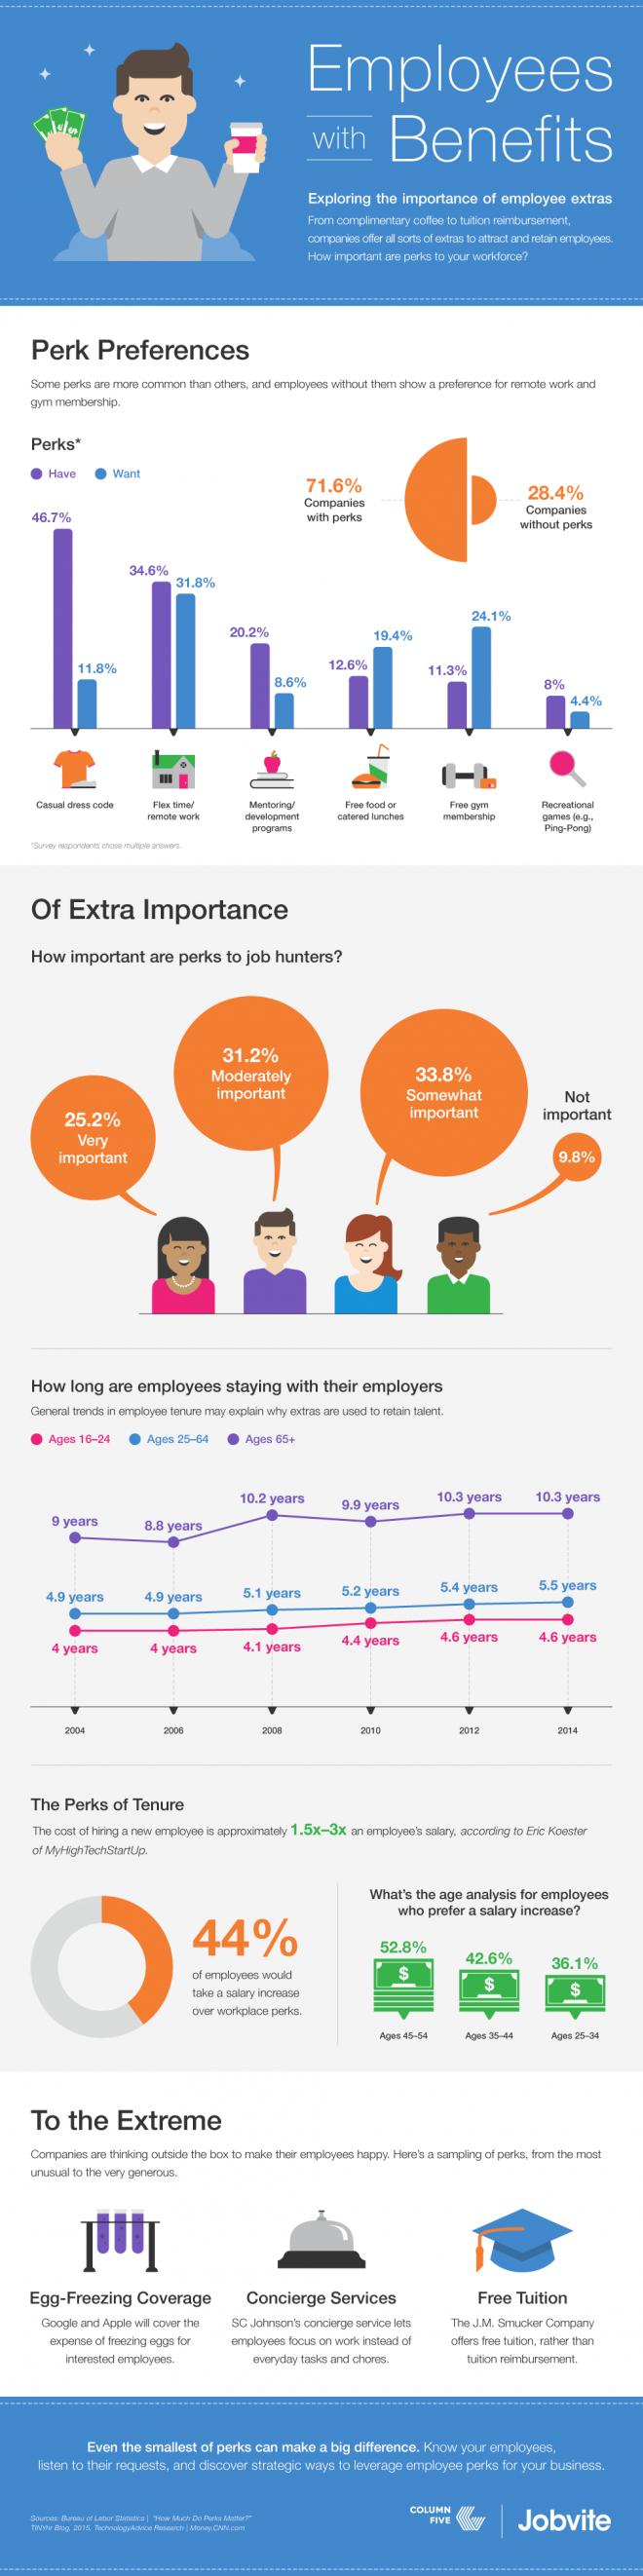 employee benefits recruiting